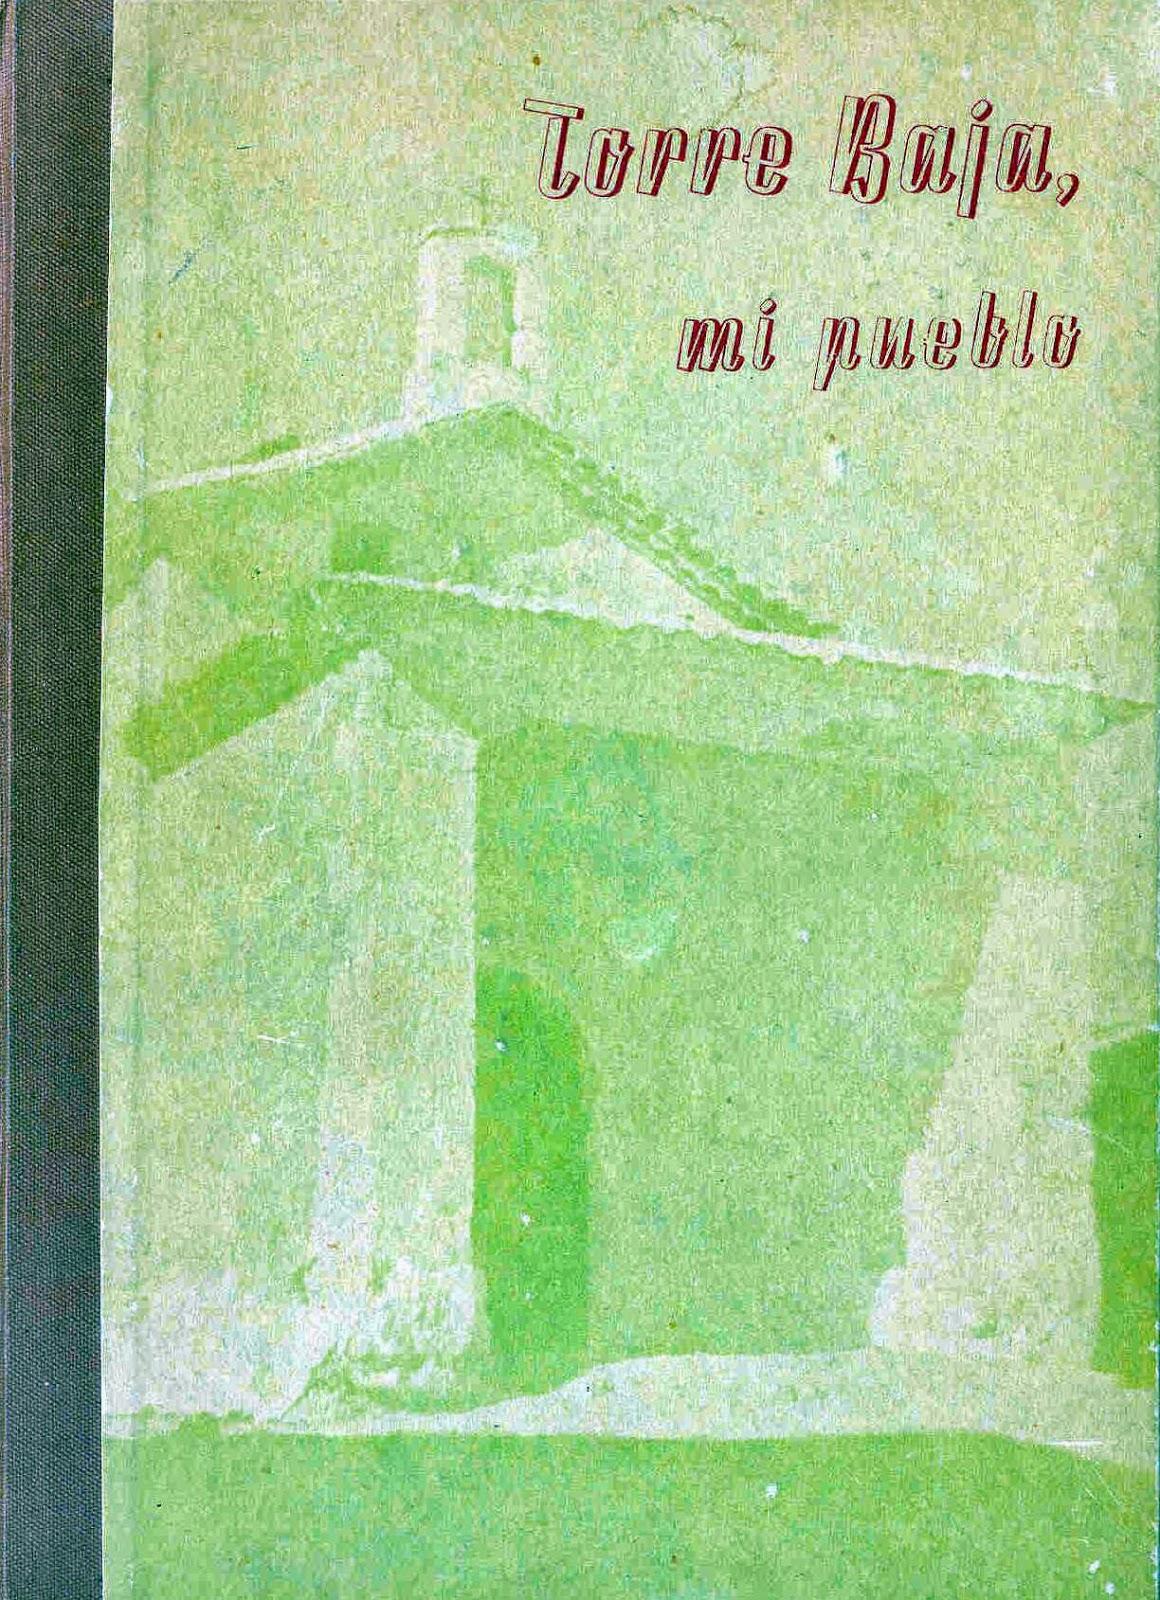 torrebaja-mi-pueblo-valencia-1953